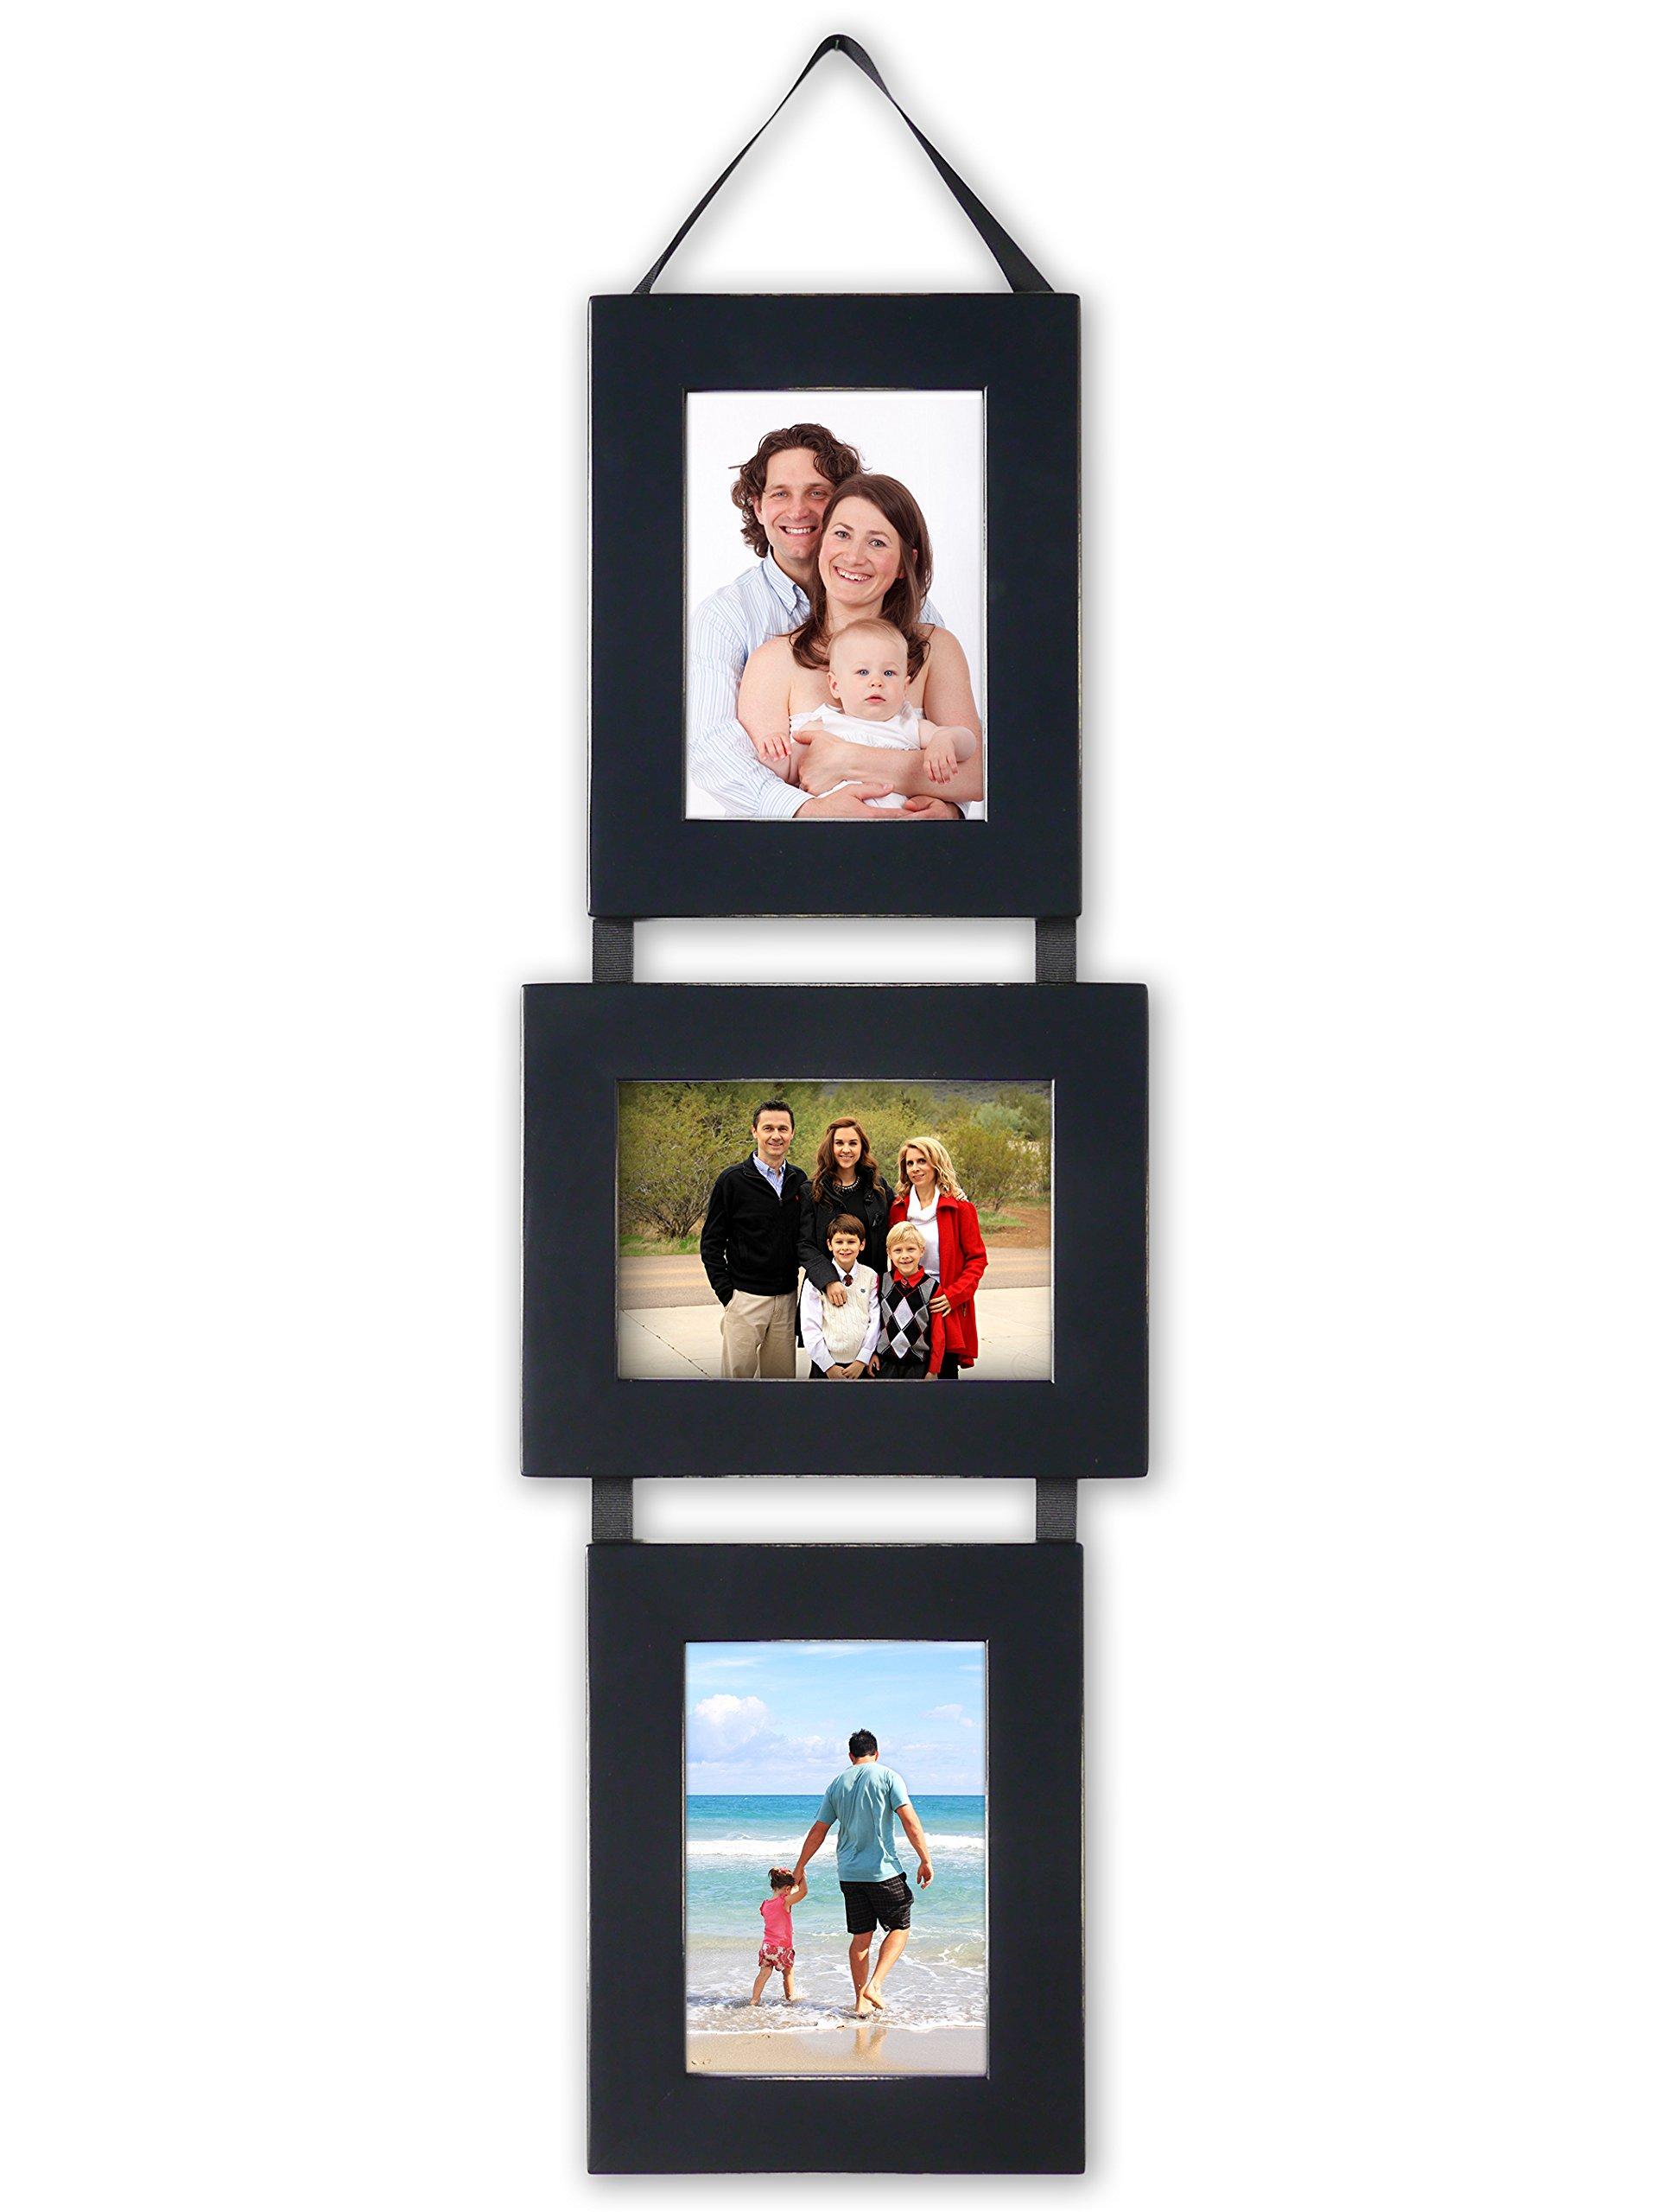 MyBarnwoodFrames - Lightly Distressed Collage Set of 3, 5 x 7 Wood Picture Frames on Hanging Ribbon, Black (Portrait-Landscape-Portrait)